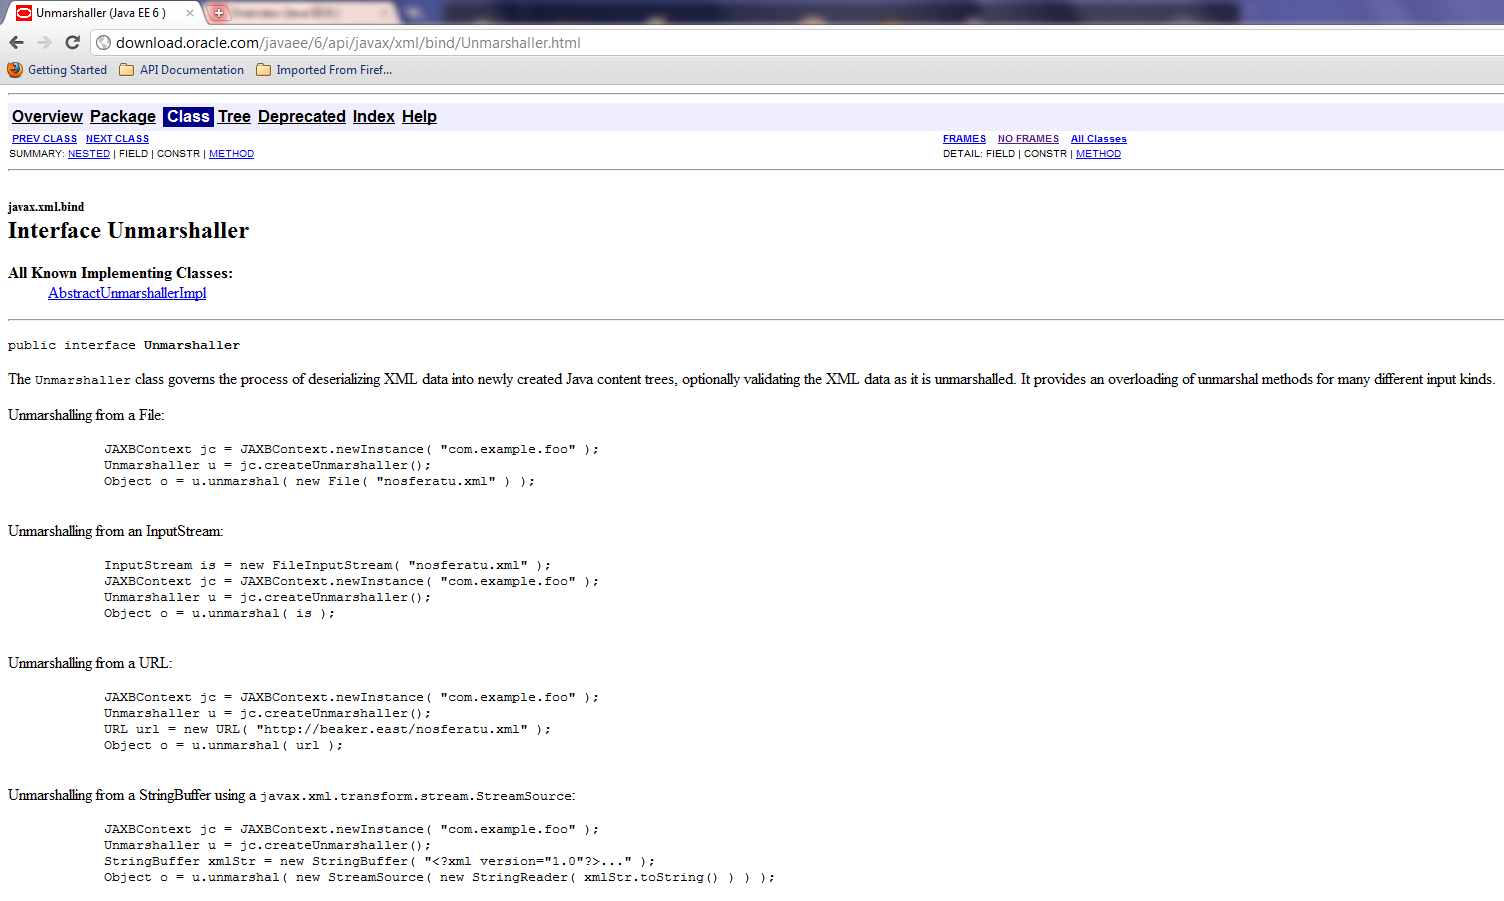 api documentation template word - effective javadoc documentation illustrated in familiar